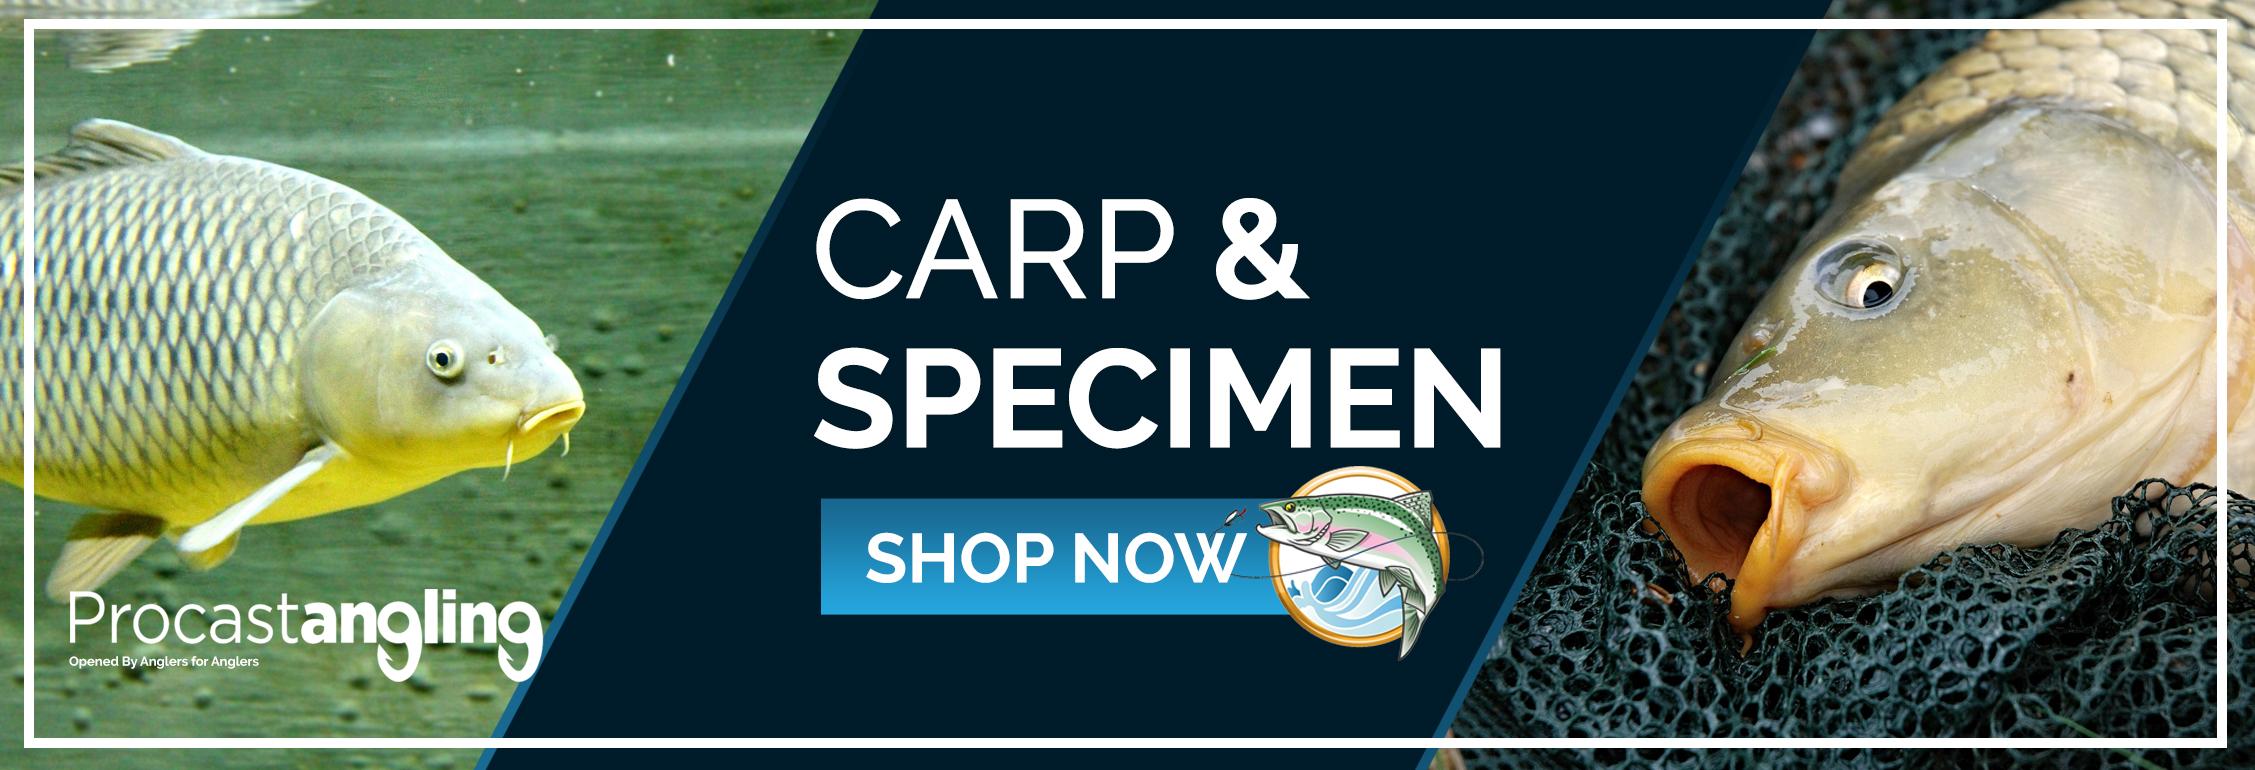 Carp & Specimen